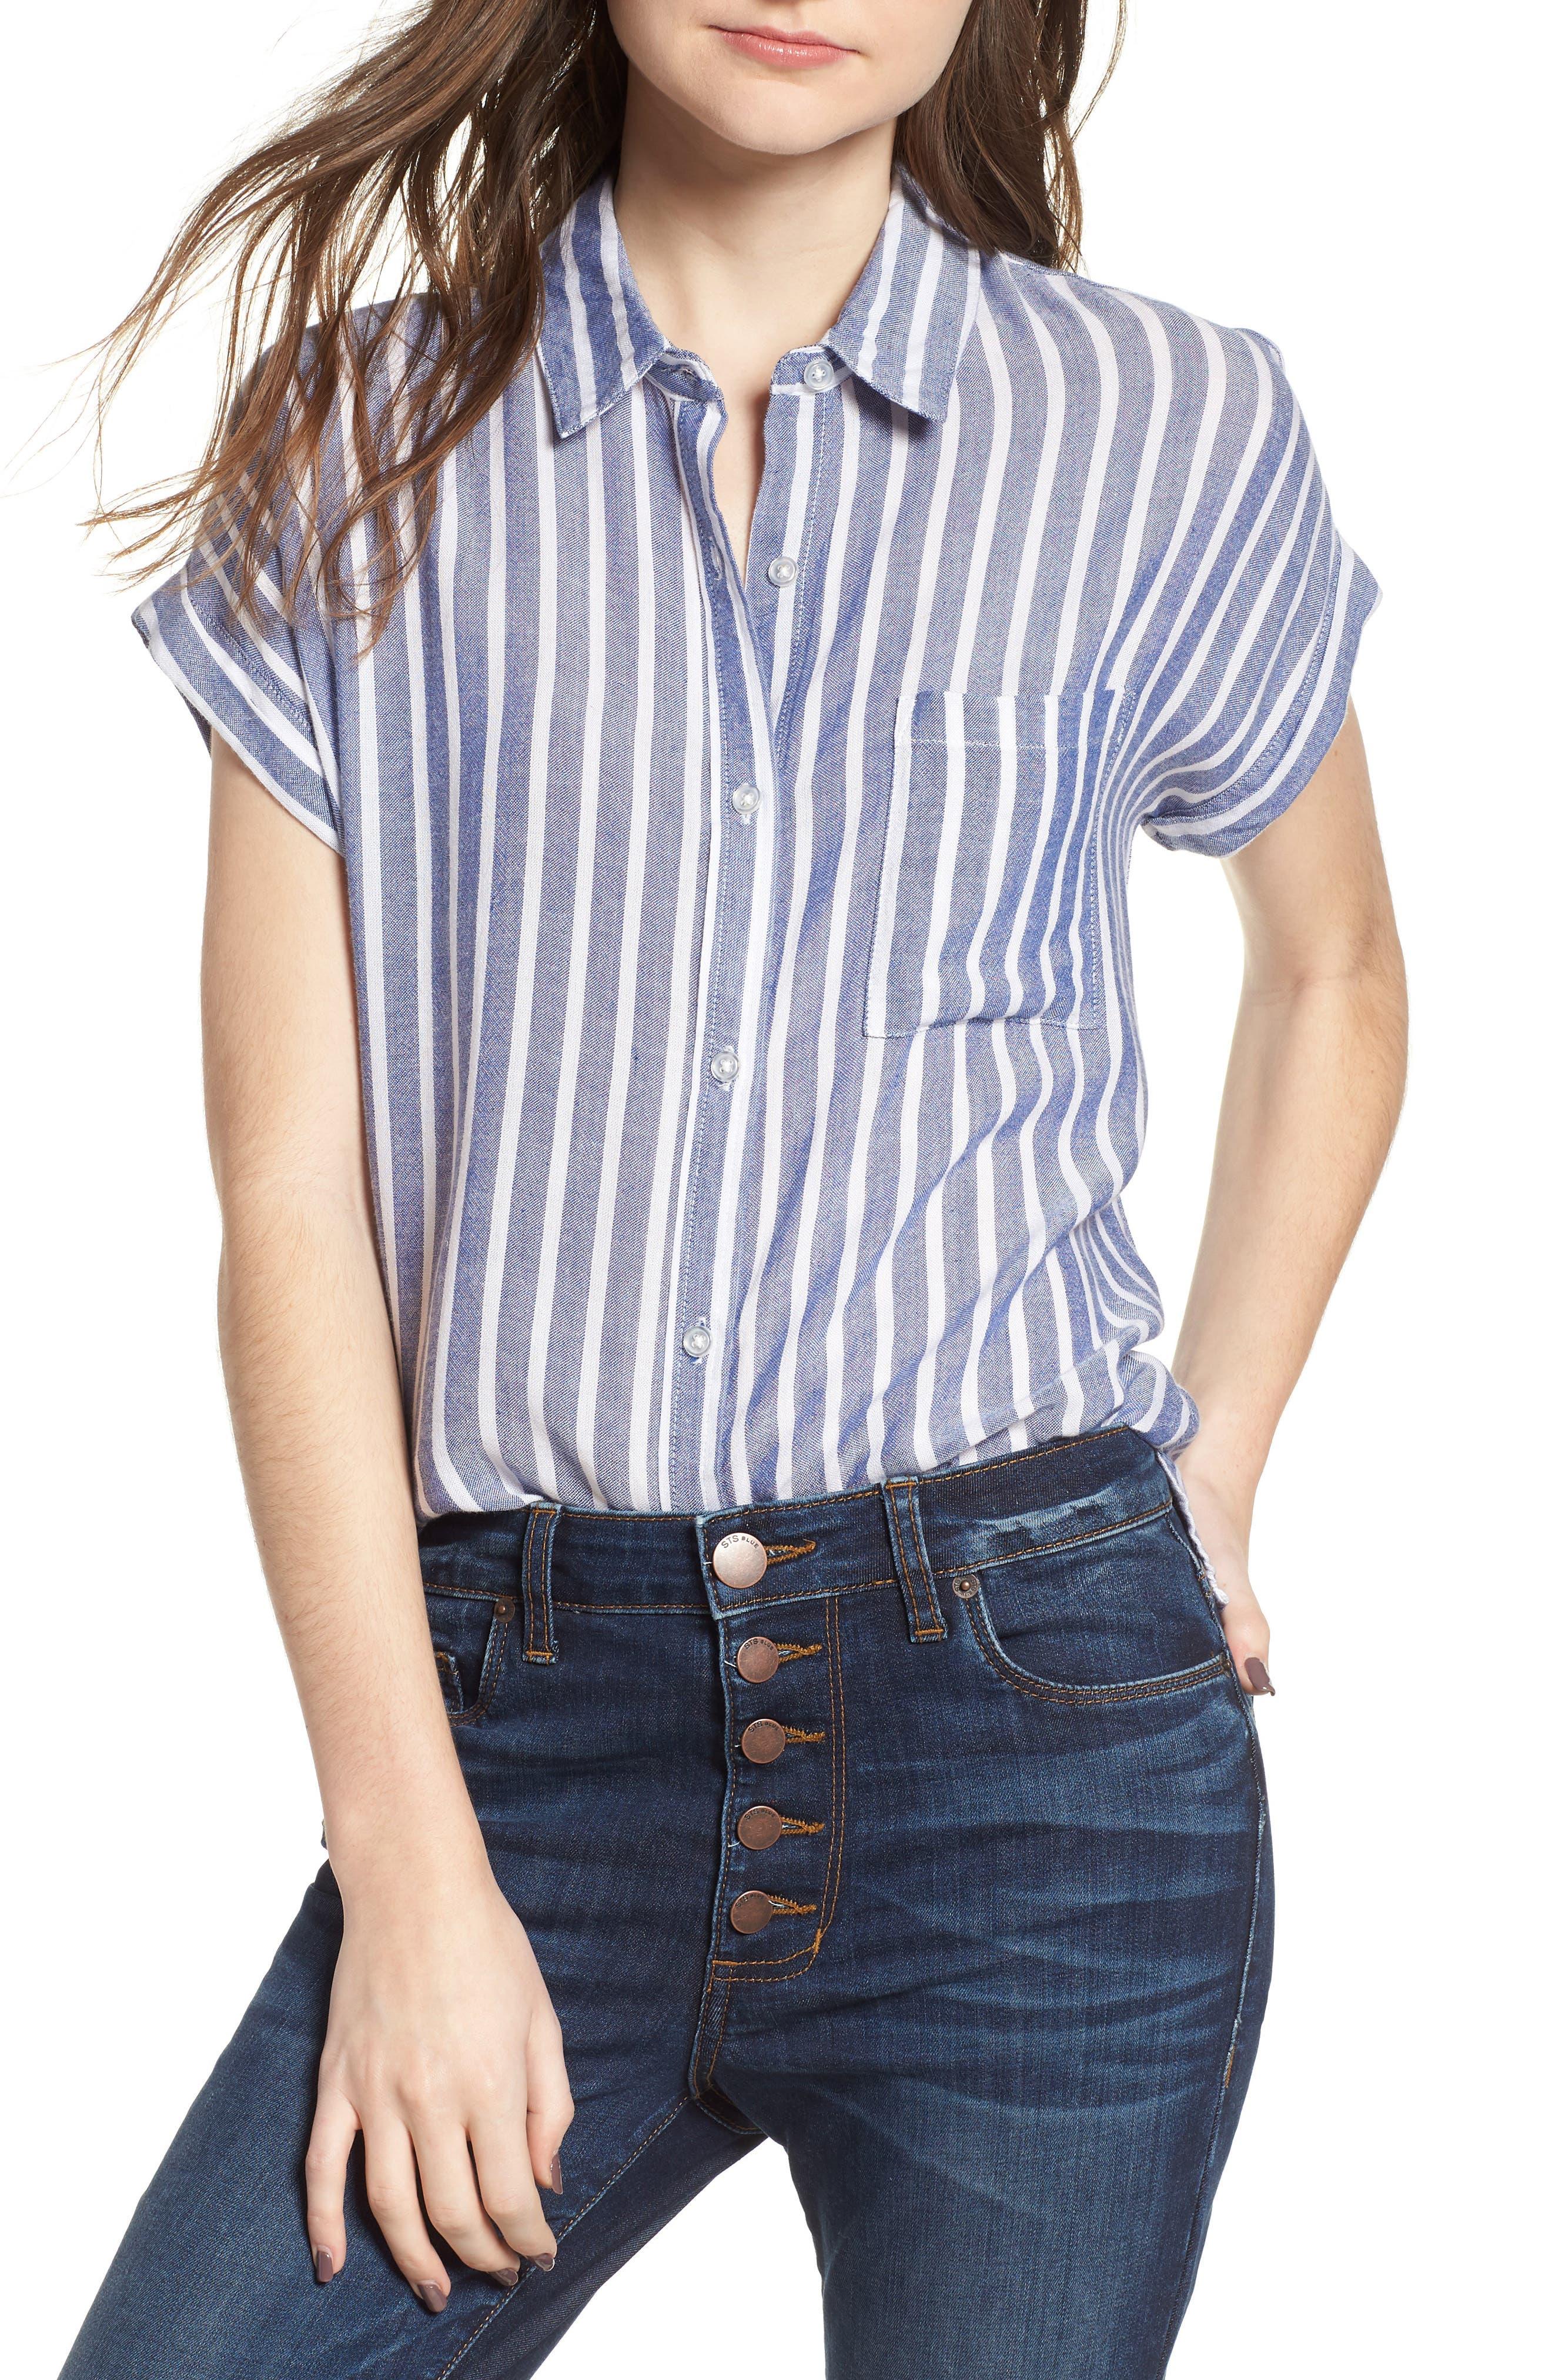 Alternate Image 1 Selected - Thread & Supply Benji Stripe Shirt